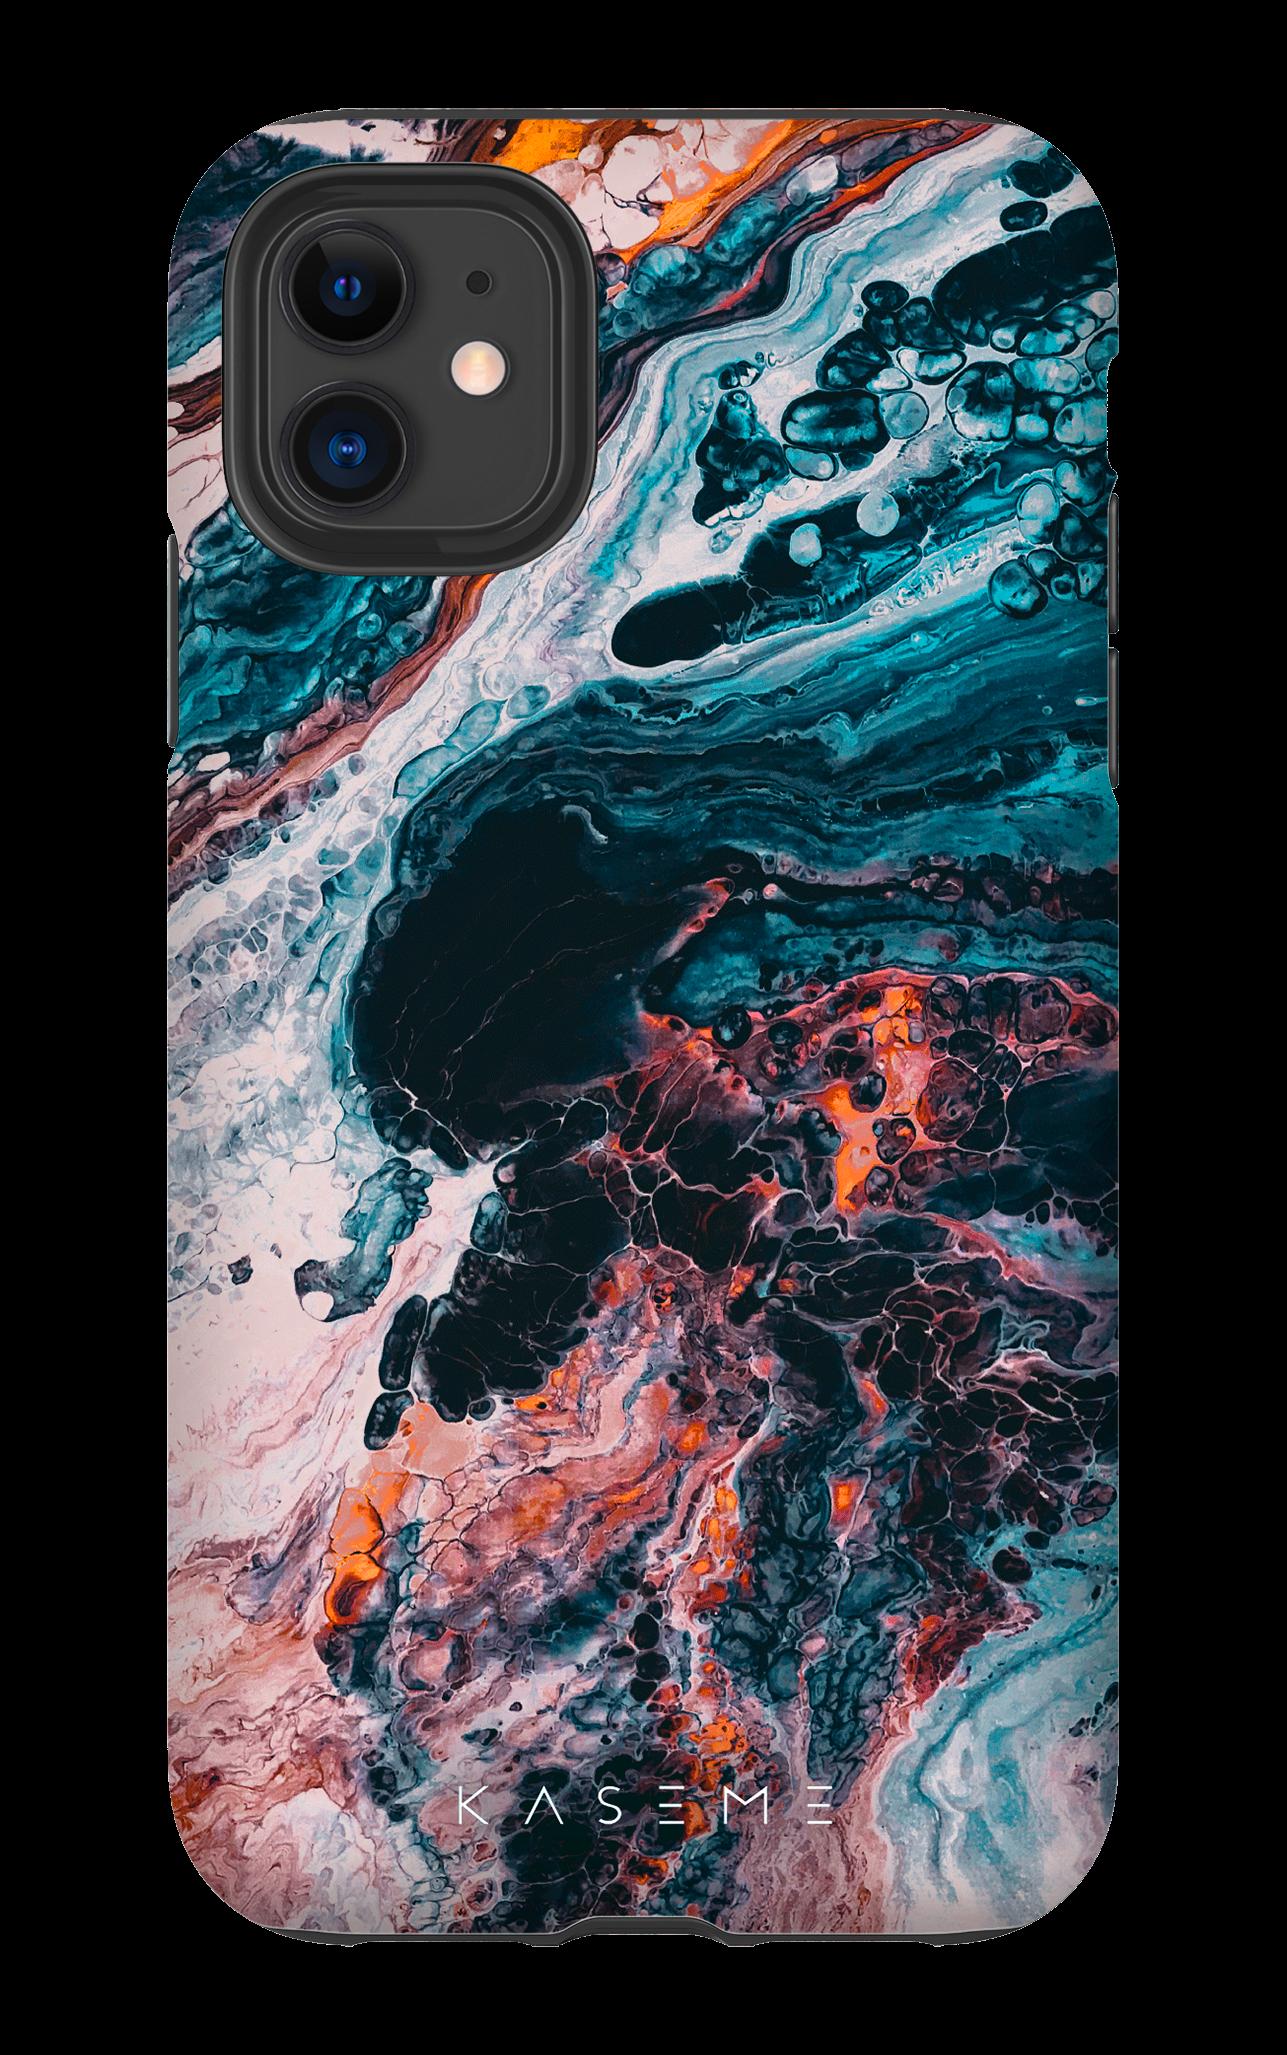 Calypso phone case